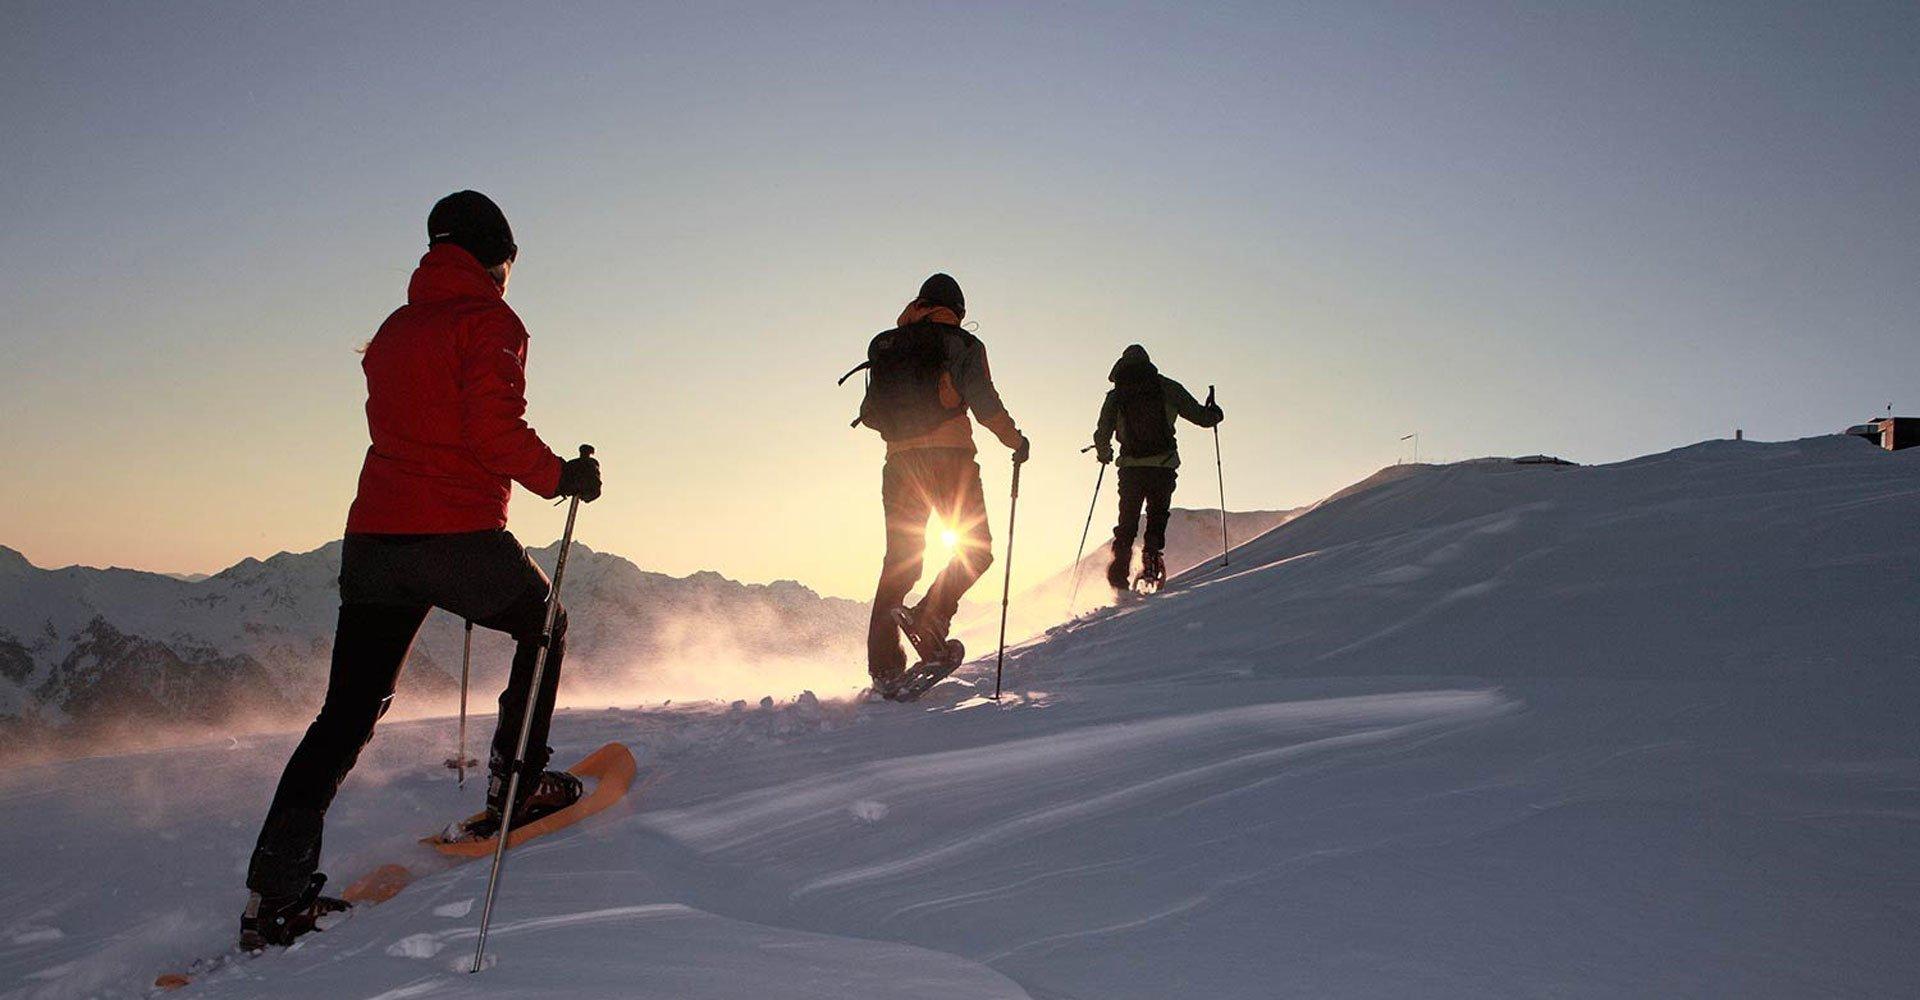 skitouren-schneeschuhwandern-ahrntal